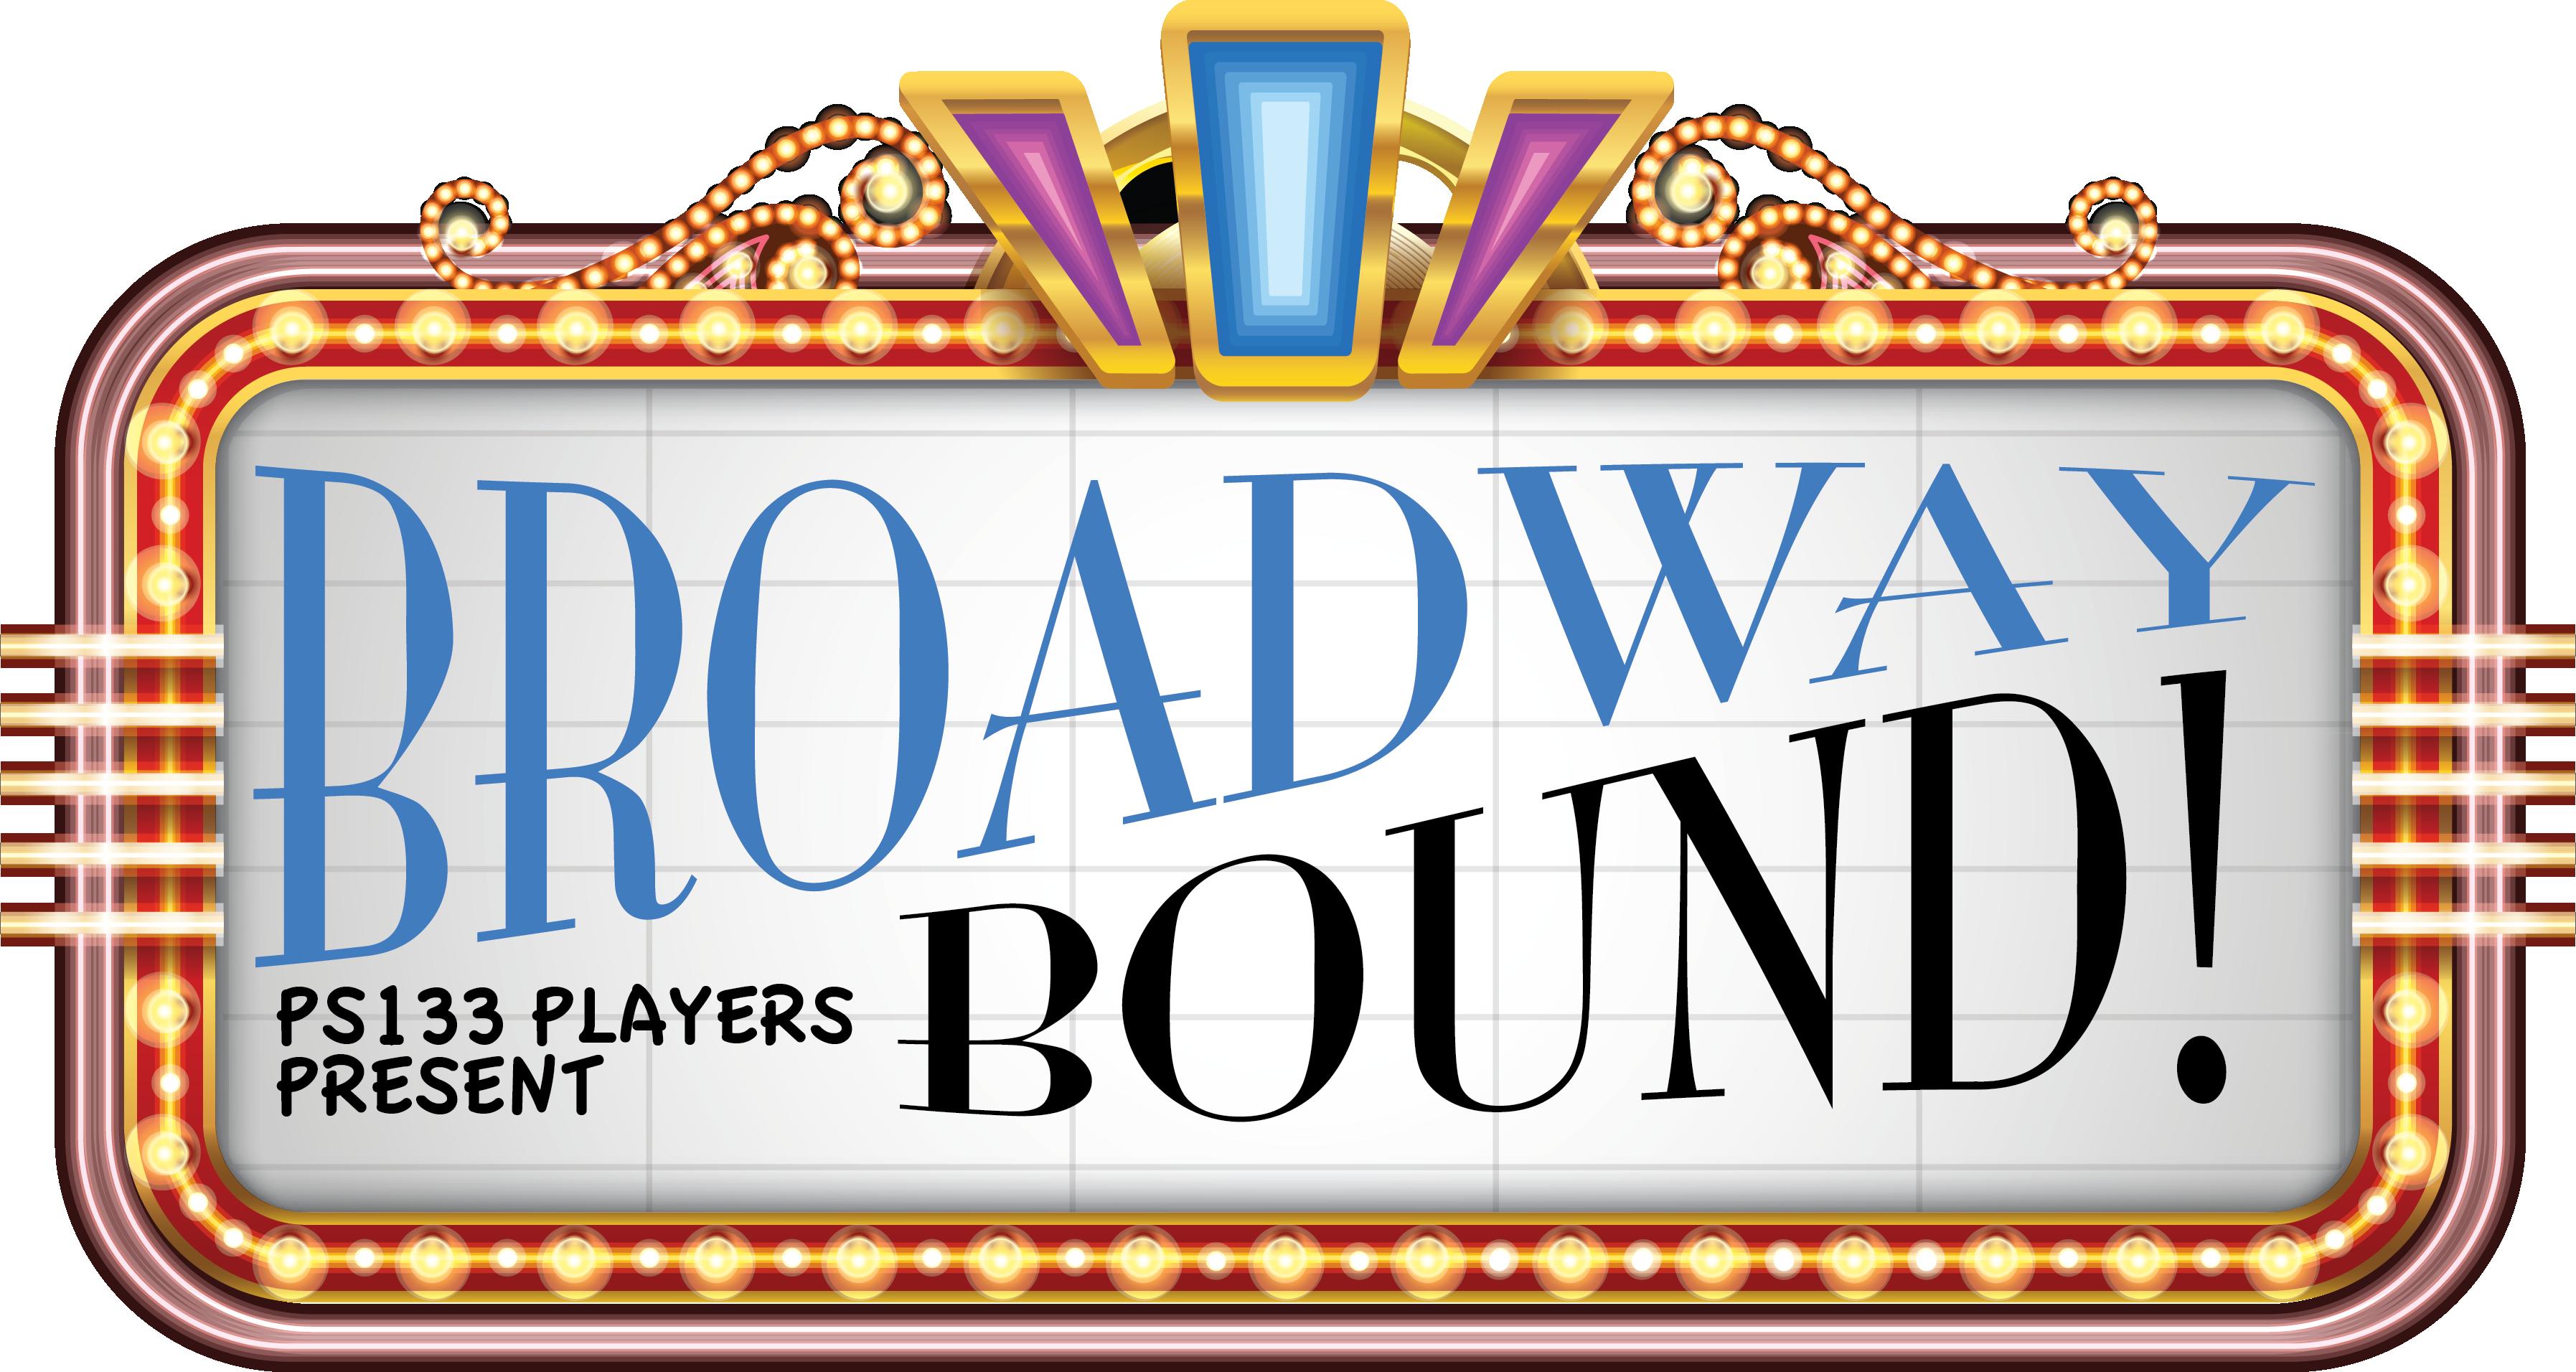 Broadway bound. Curriculum clipart curriculum night